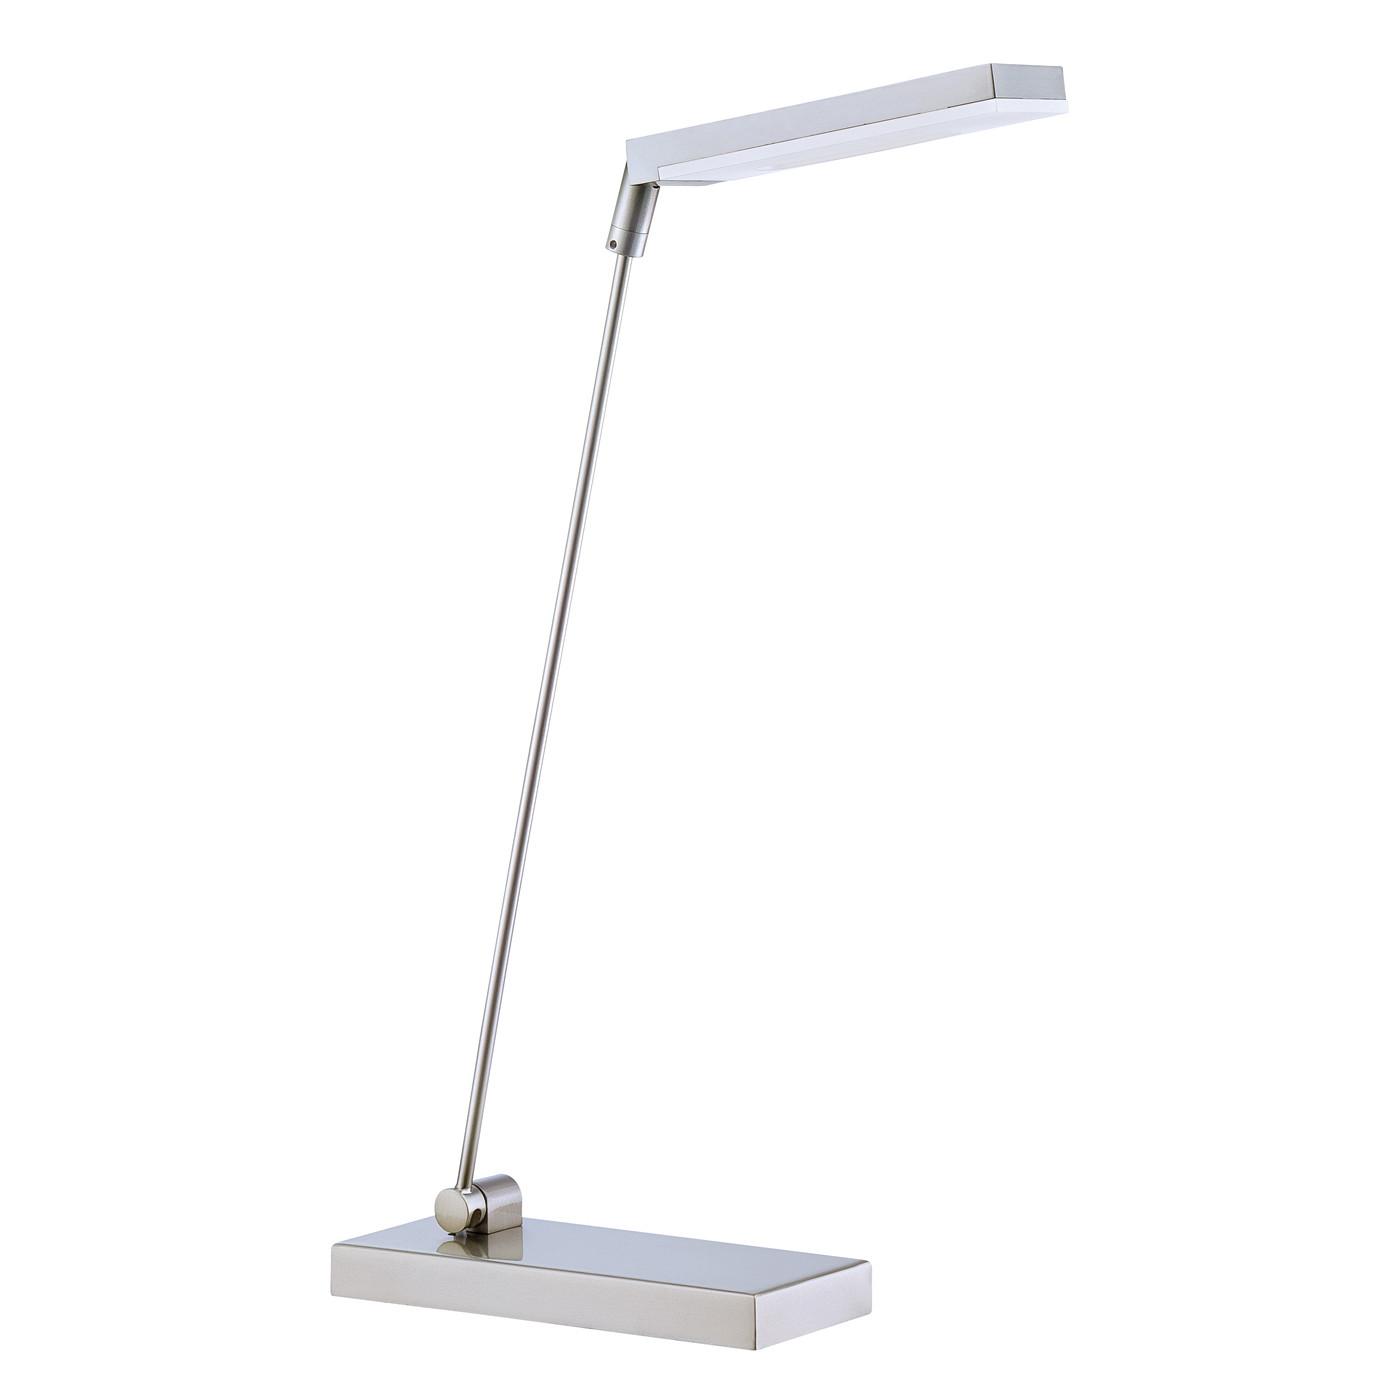 Best ideas about Desk Lamp Led . Save or Pin Kendal Lighting PTL4076 SN 1 Light LED Desk Lamp Now.